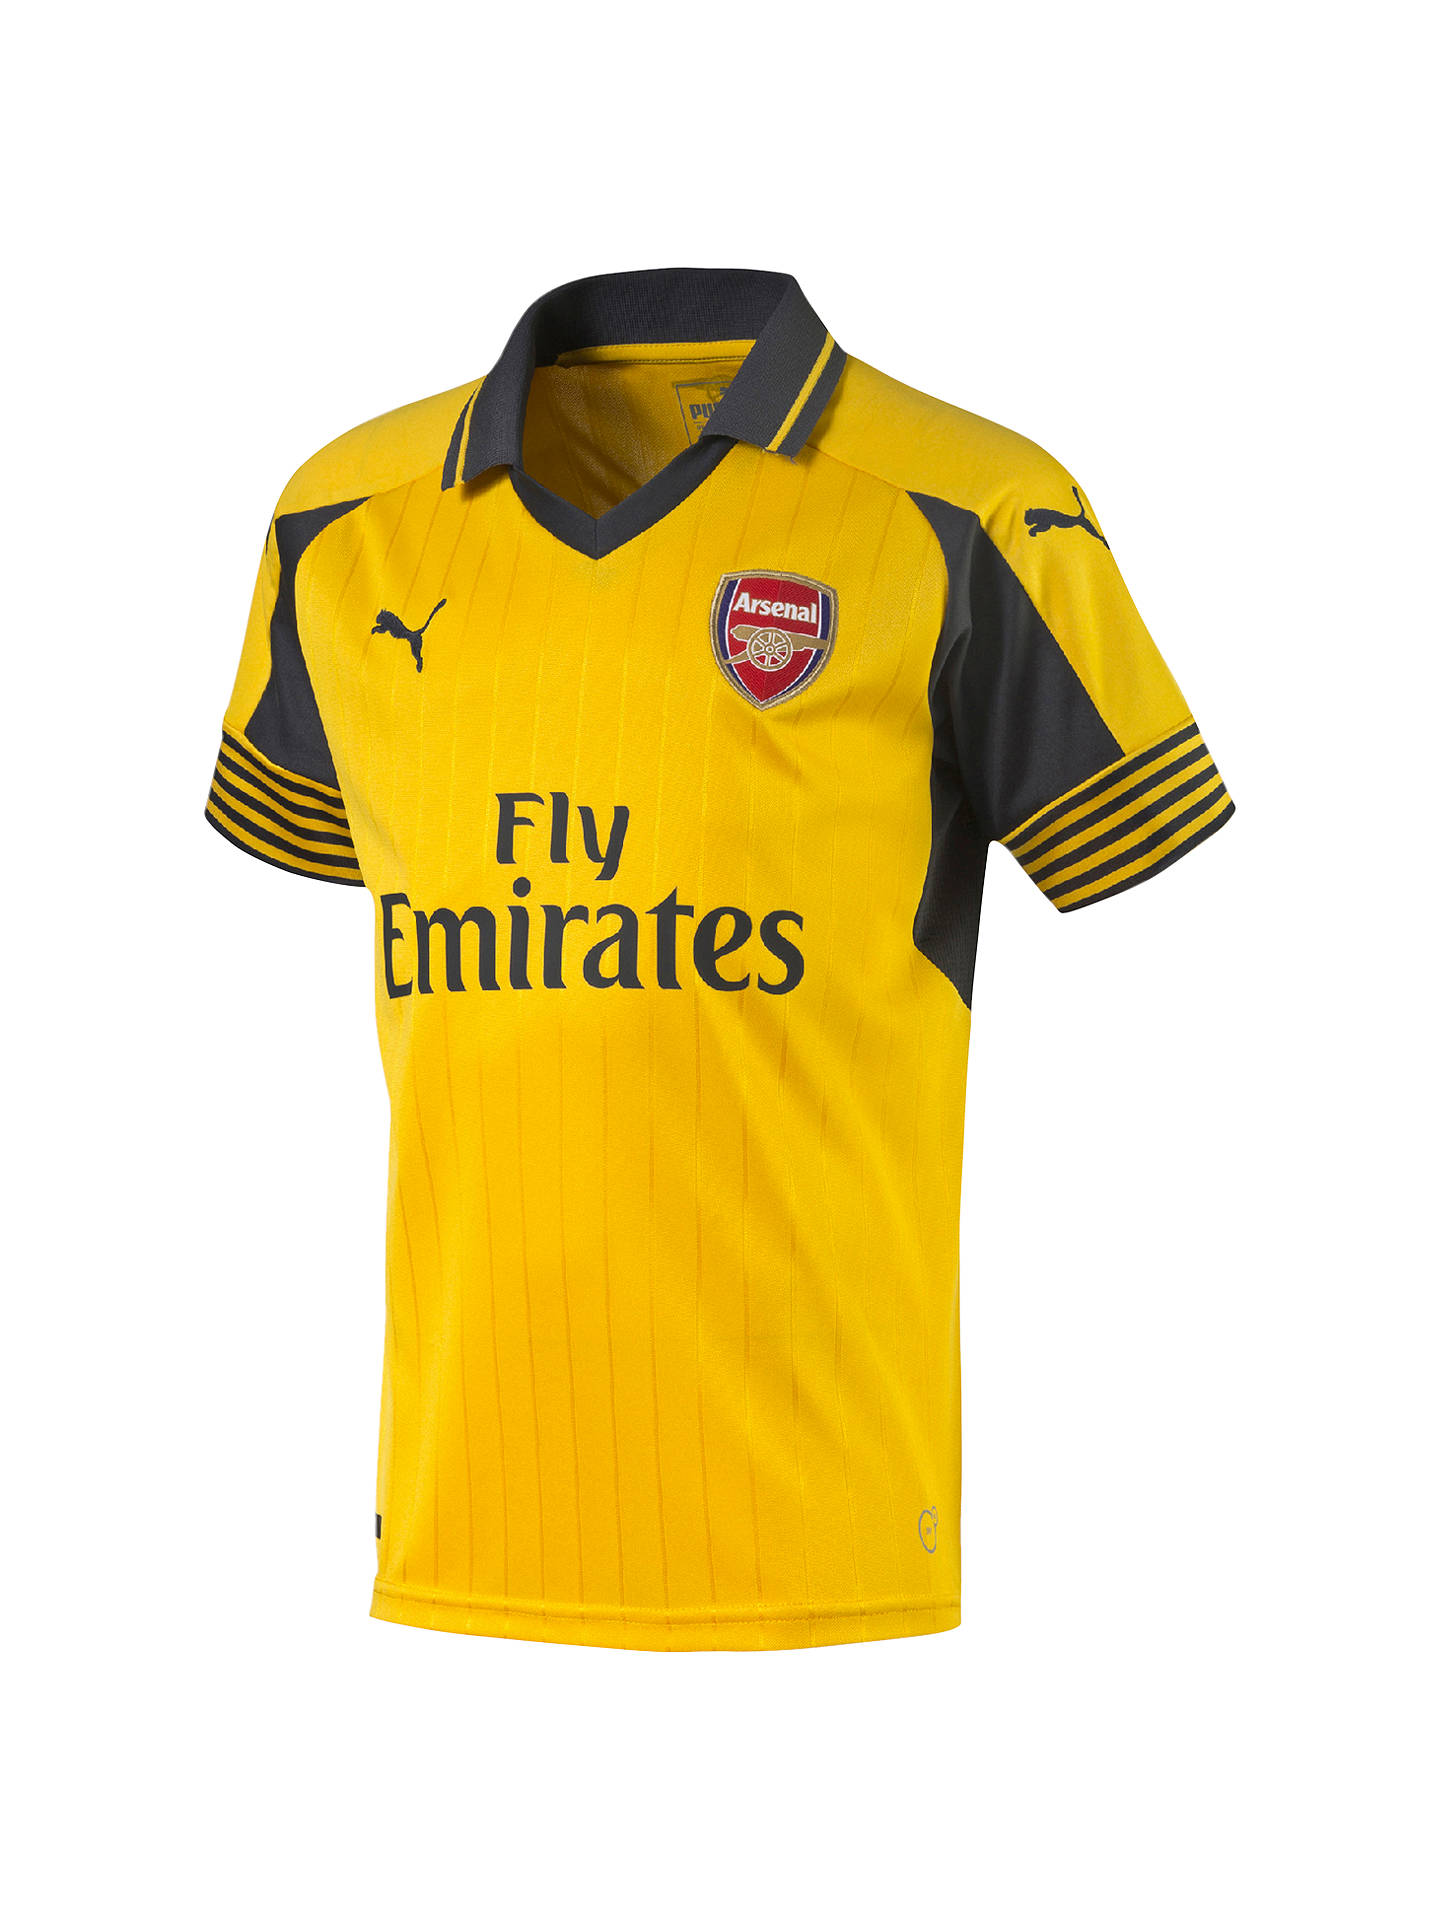 0caf393cf BuyPuma Children s Arsenal F.C. 2016 17 Away Football Shirt